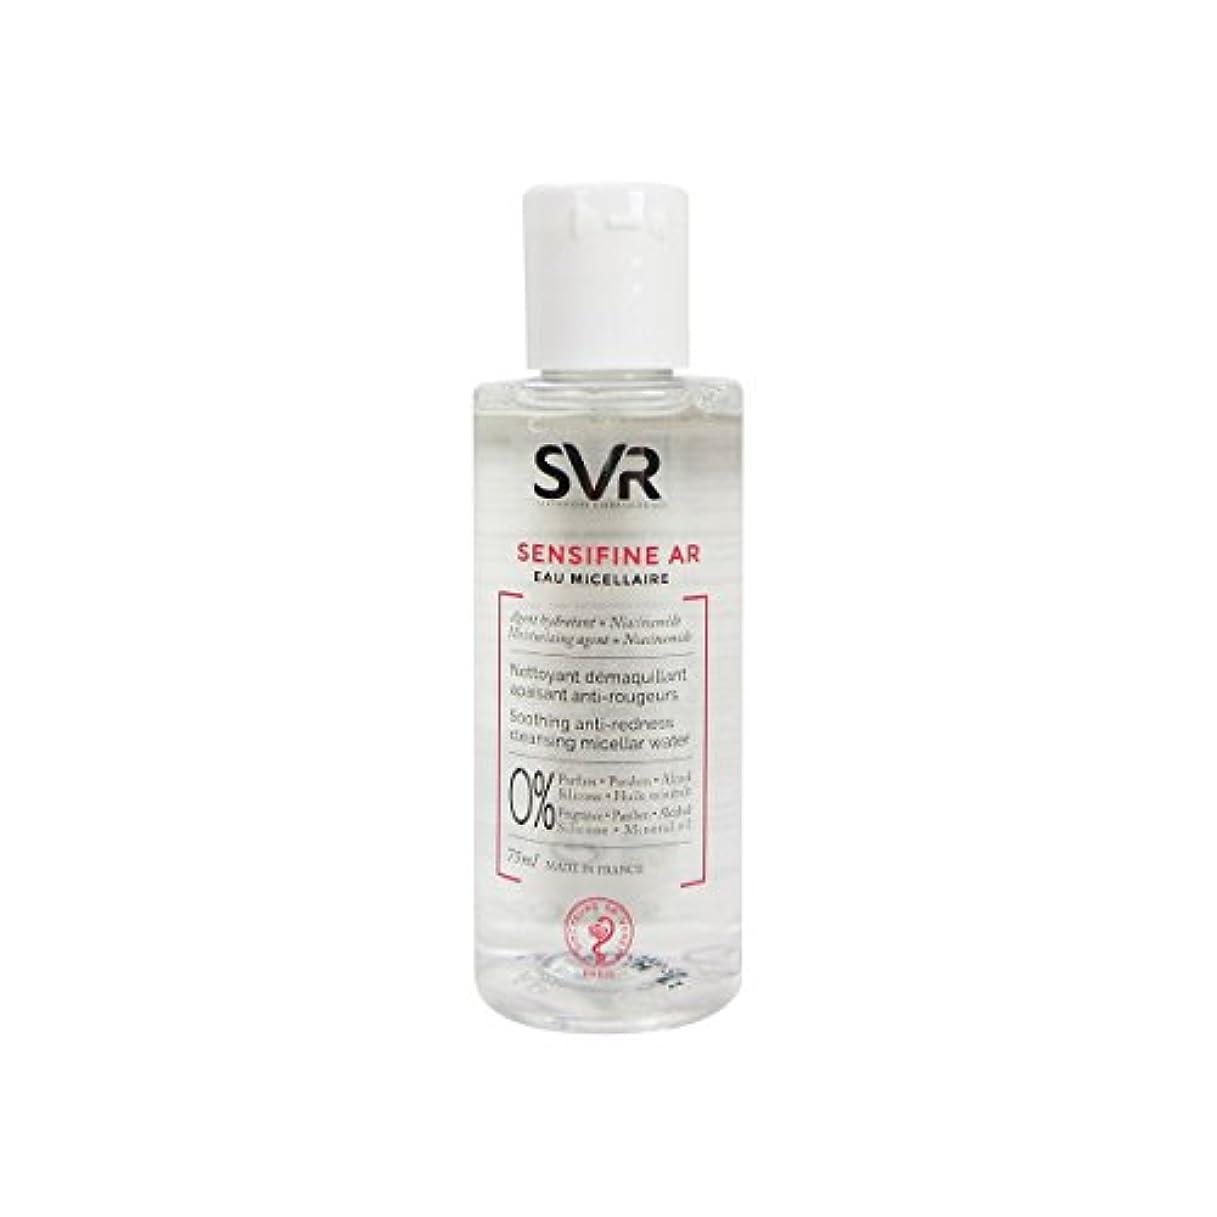 欠伸前部月曜日Svr Sensifine Ar Micellar Water Soothing Anti Redness 75ml [並行輸入品]